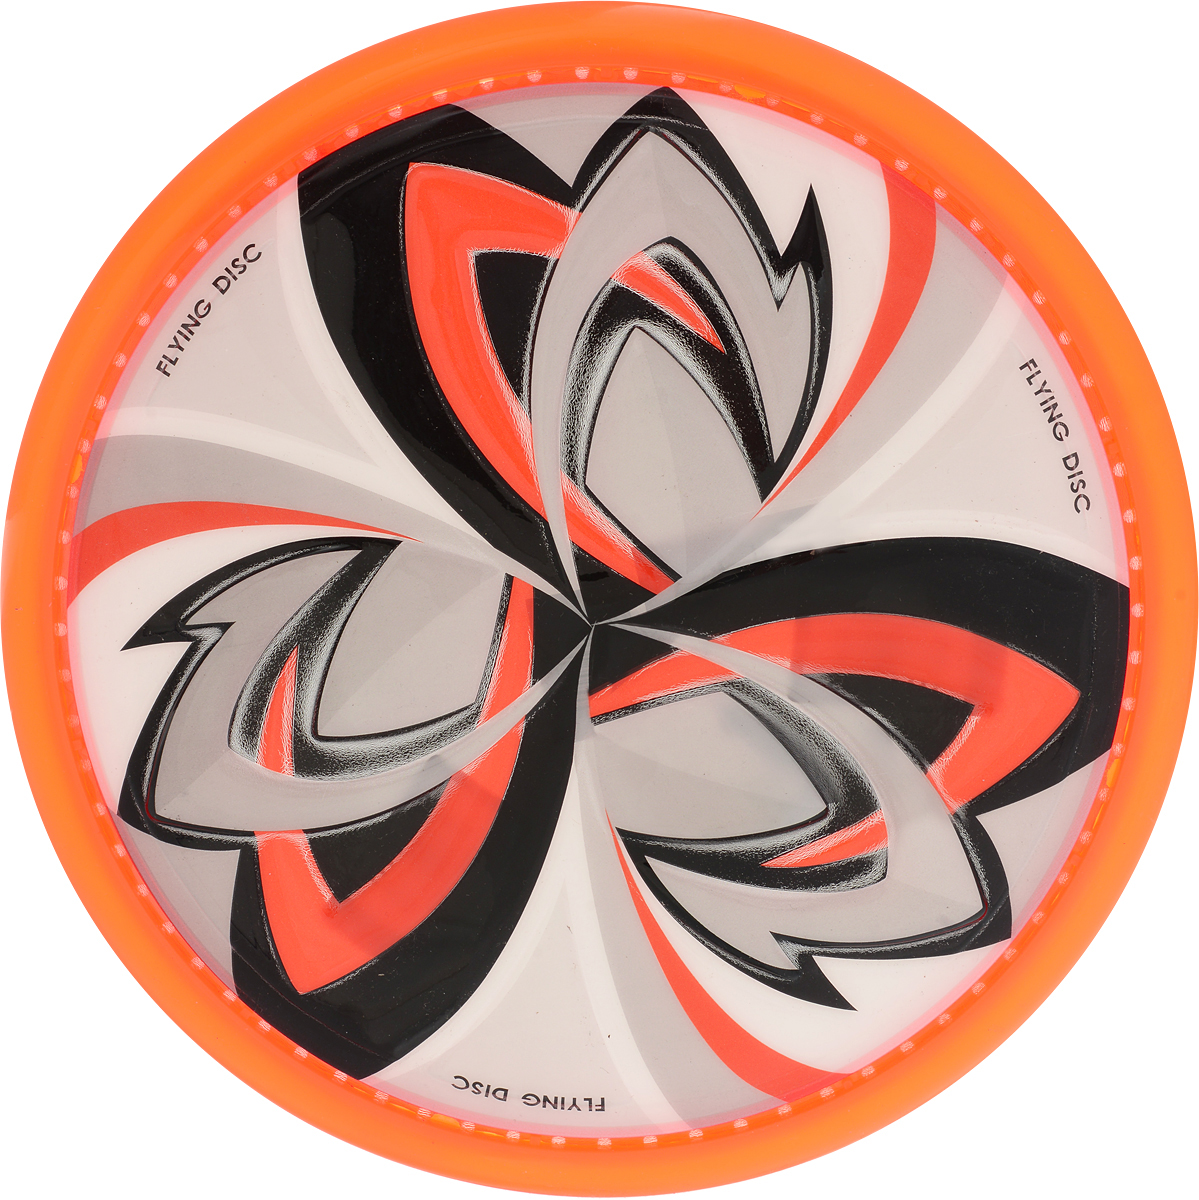 все цены на YG Sport Летающая тарелка цвет оранжевый диаметр 25 см